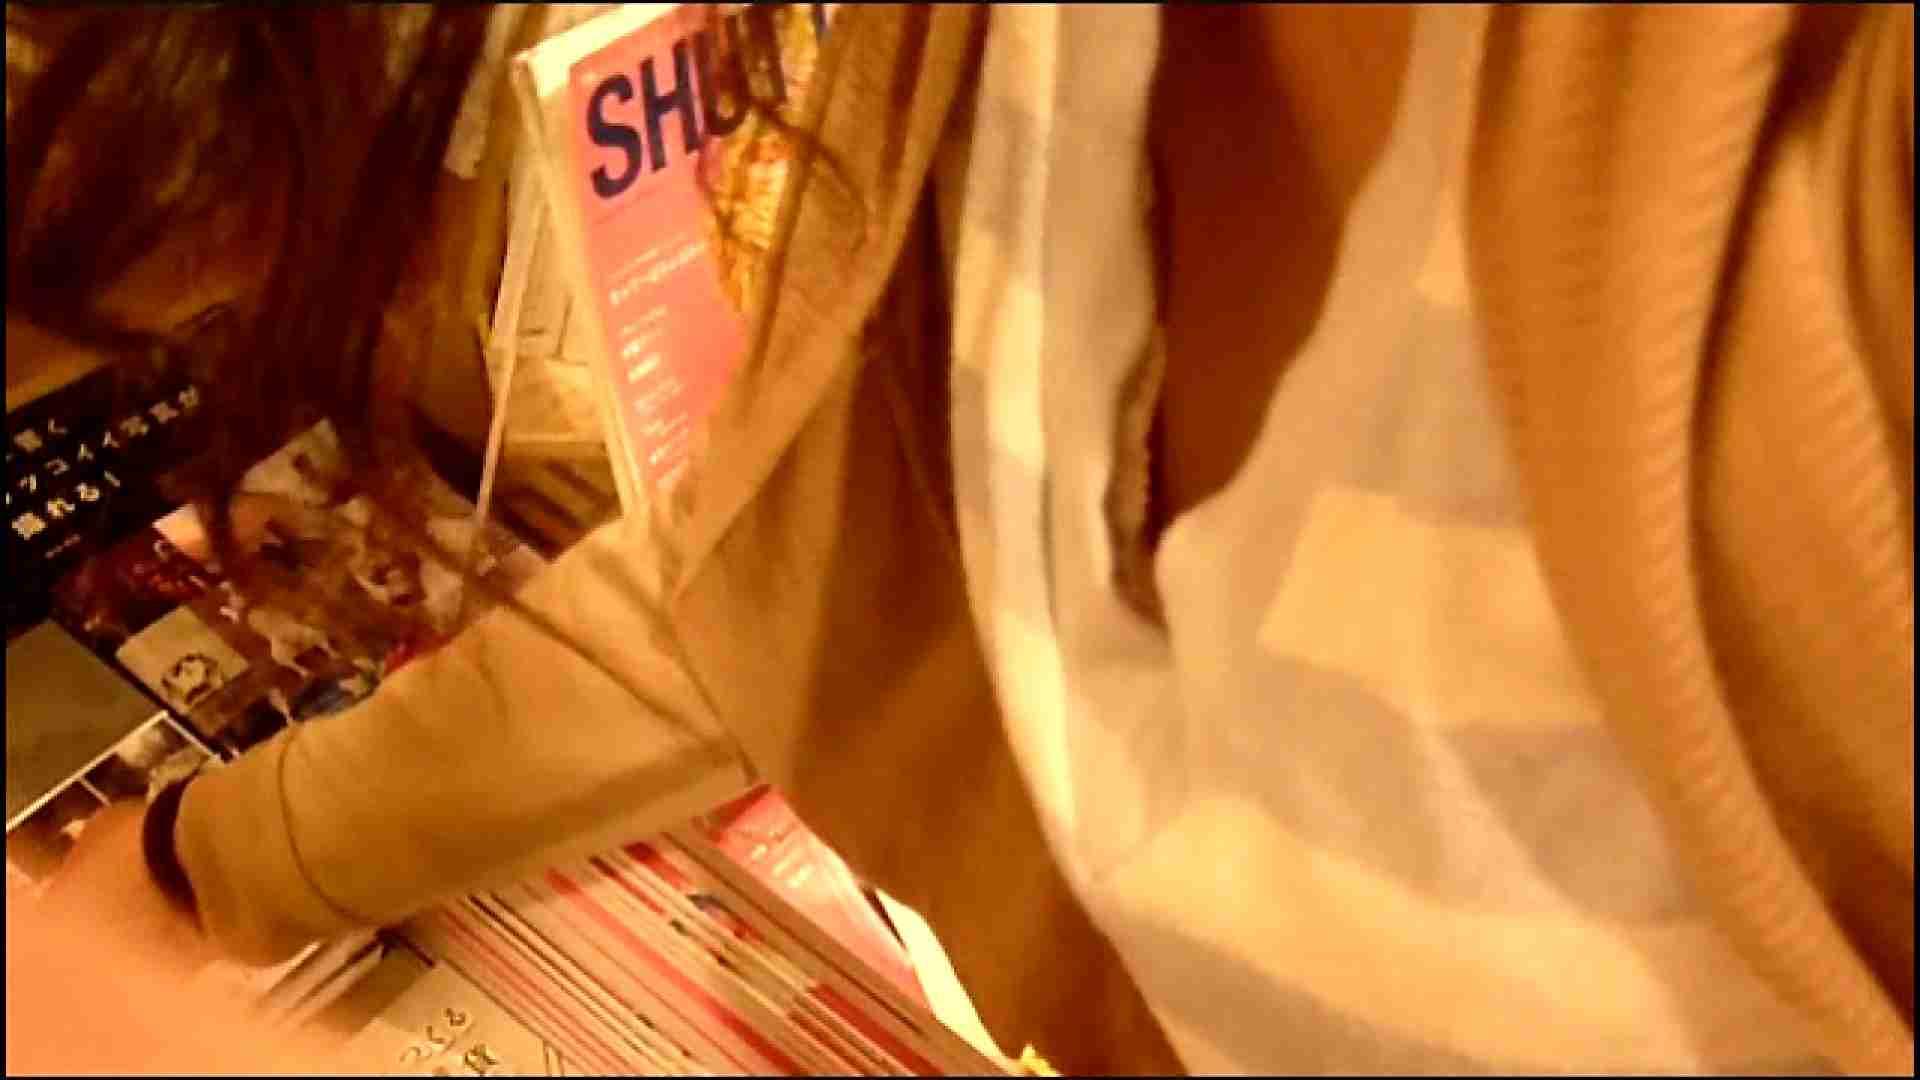 NO.3 某イオNN店内のエレベーター前でケータイに夢中な女の子 お姉さんの胸チラ  46画像 42